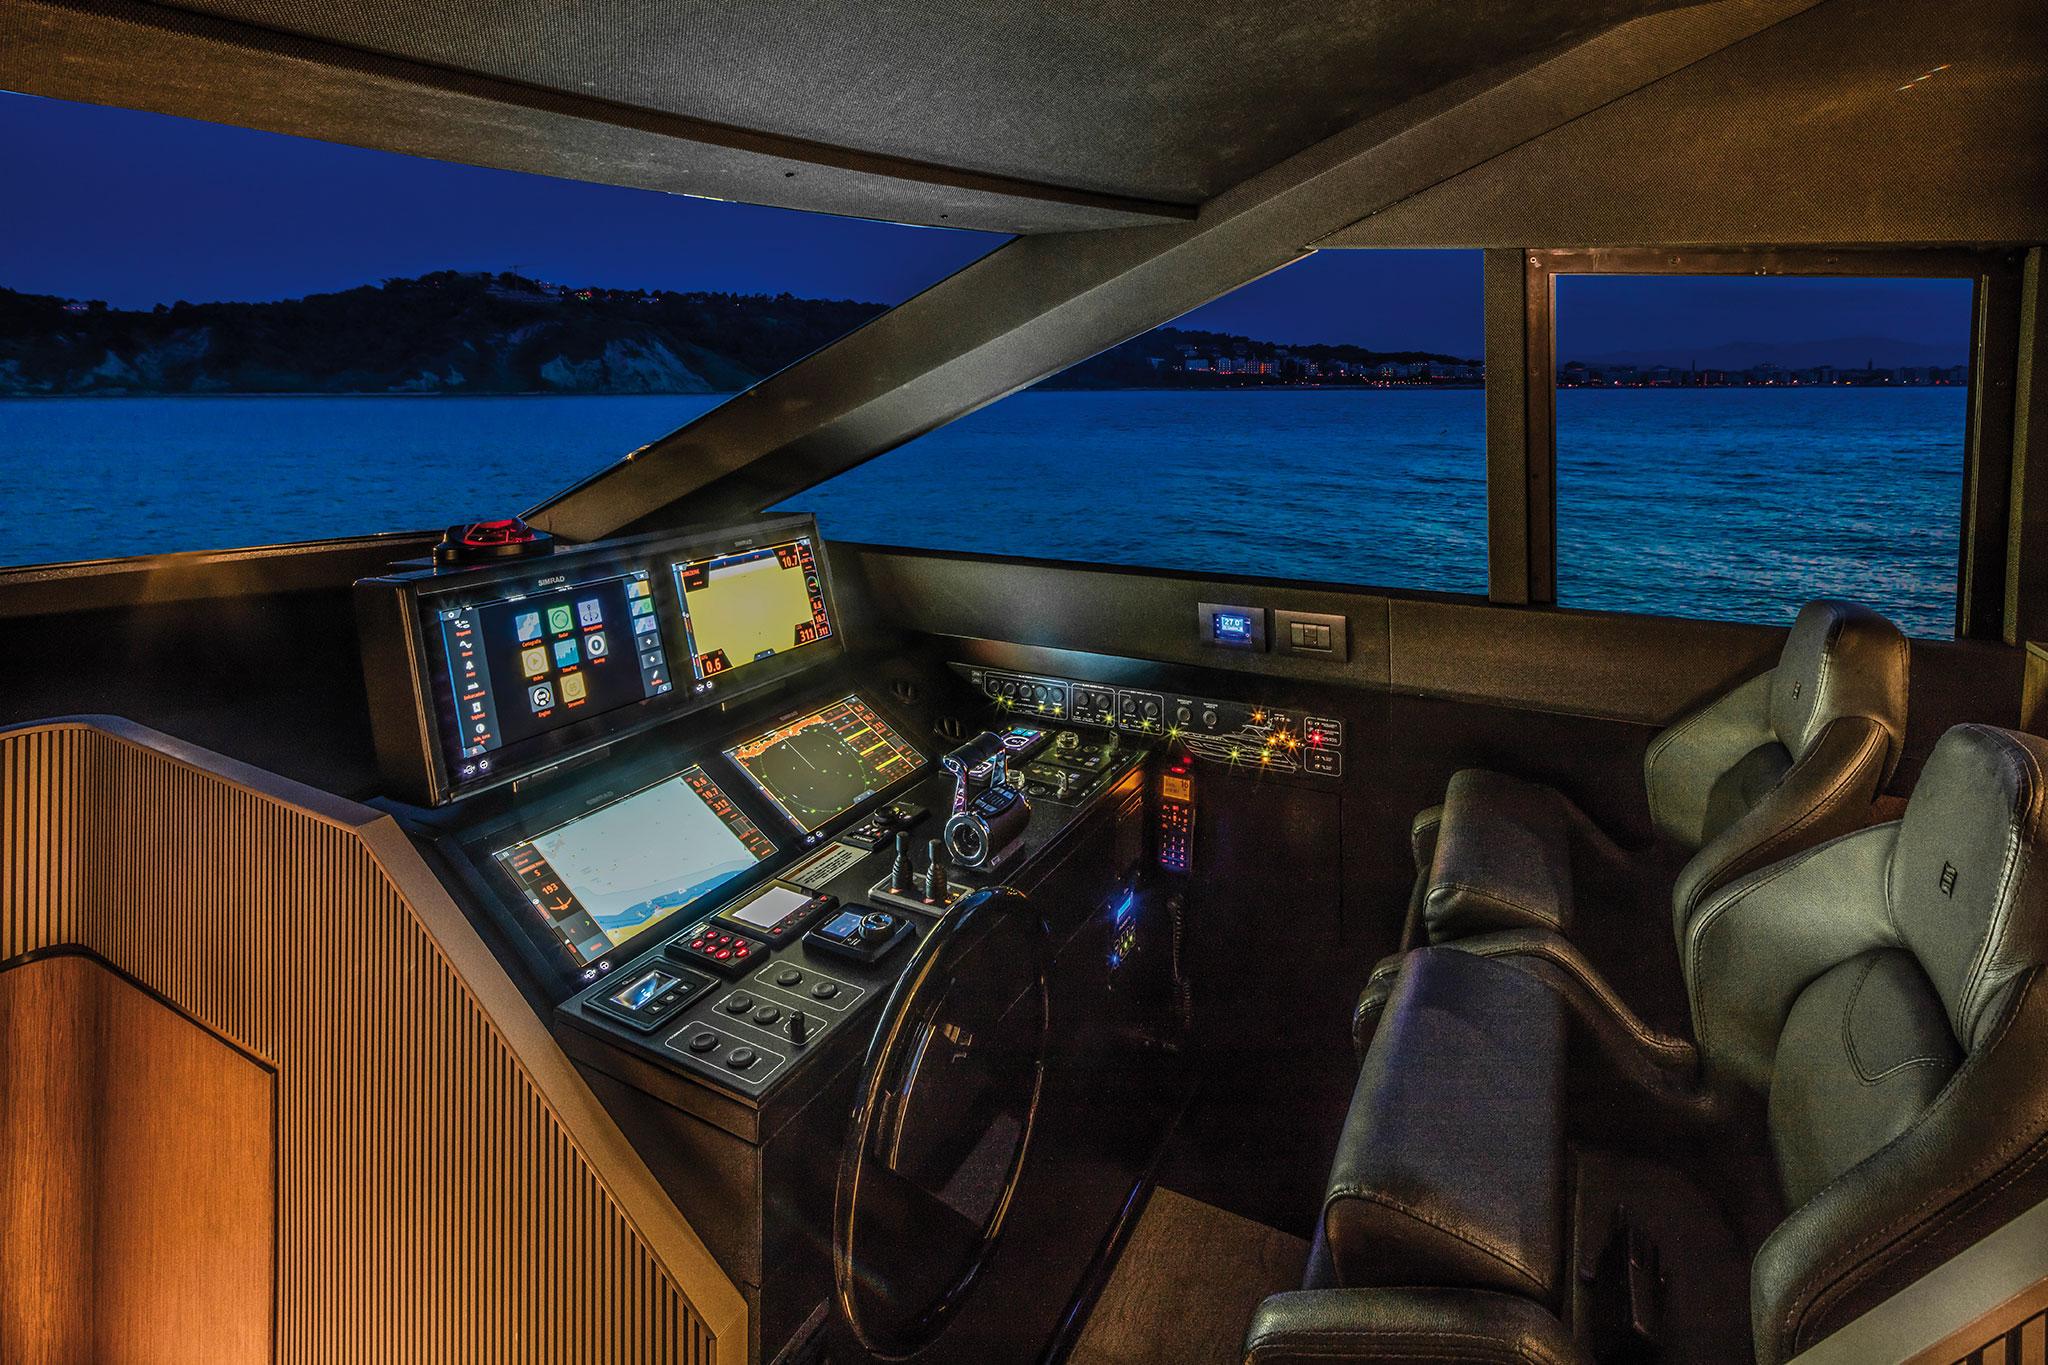 ferretti-Yachts-720-pilot-house-yachts-france-173